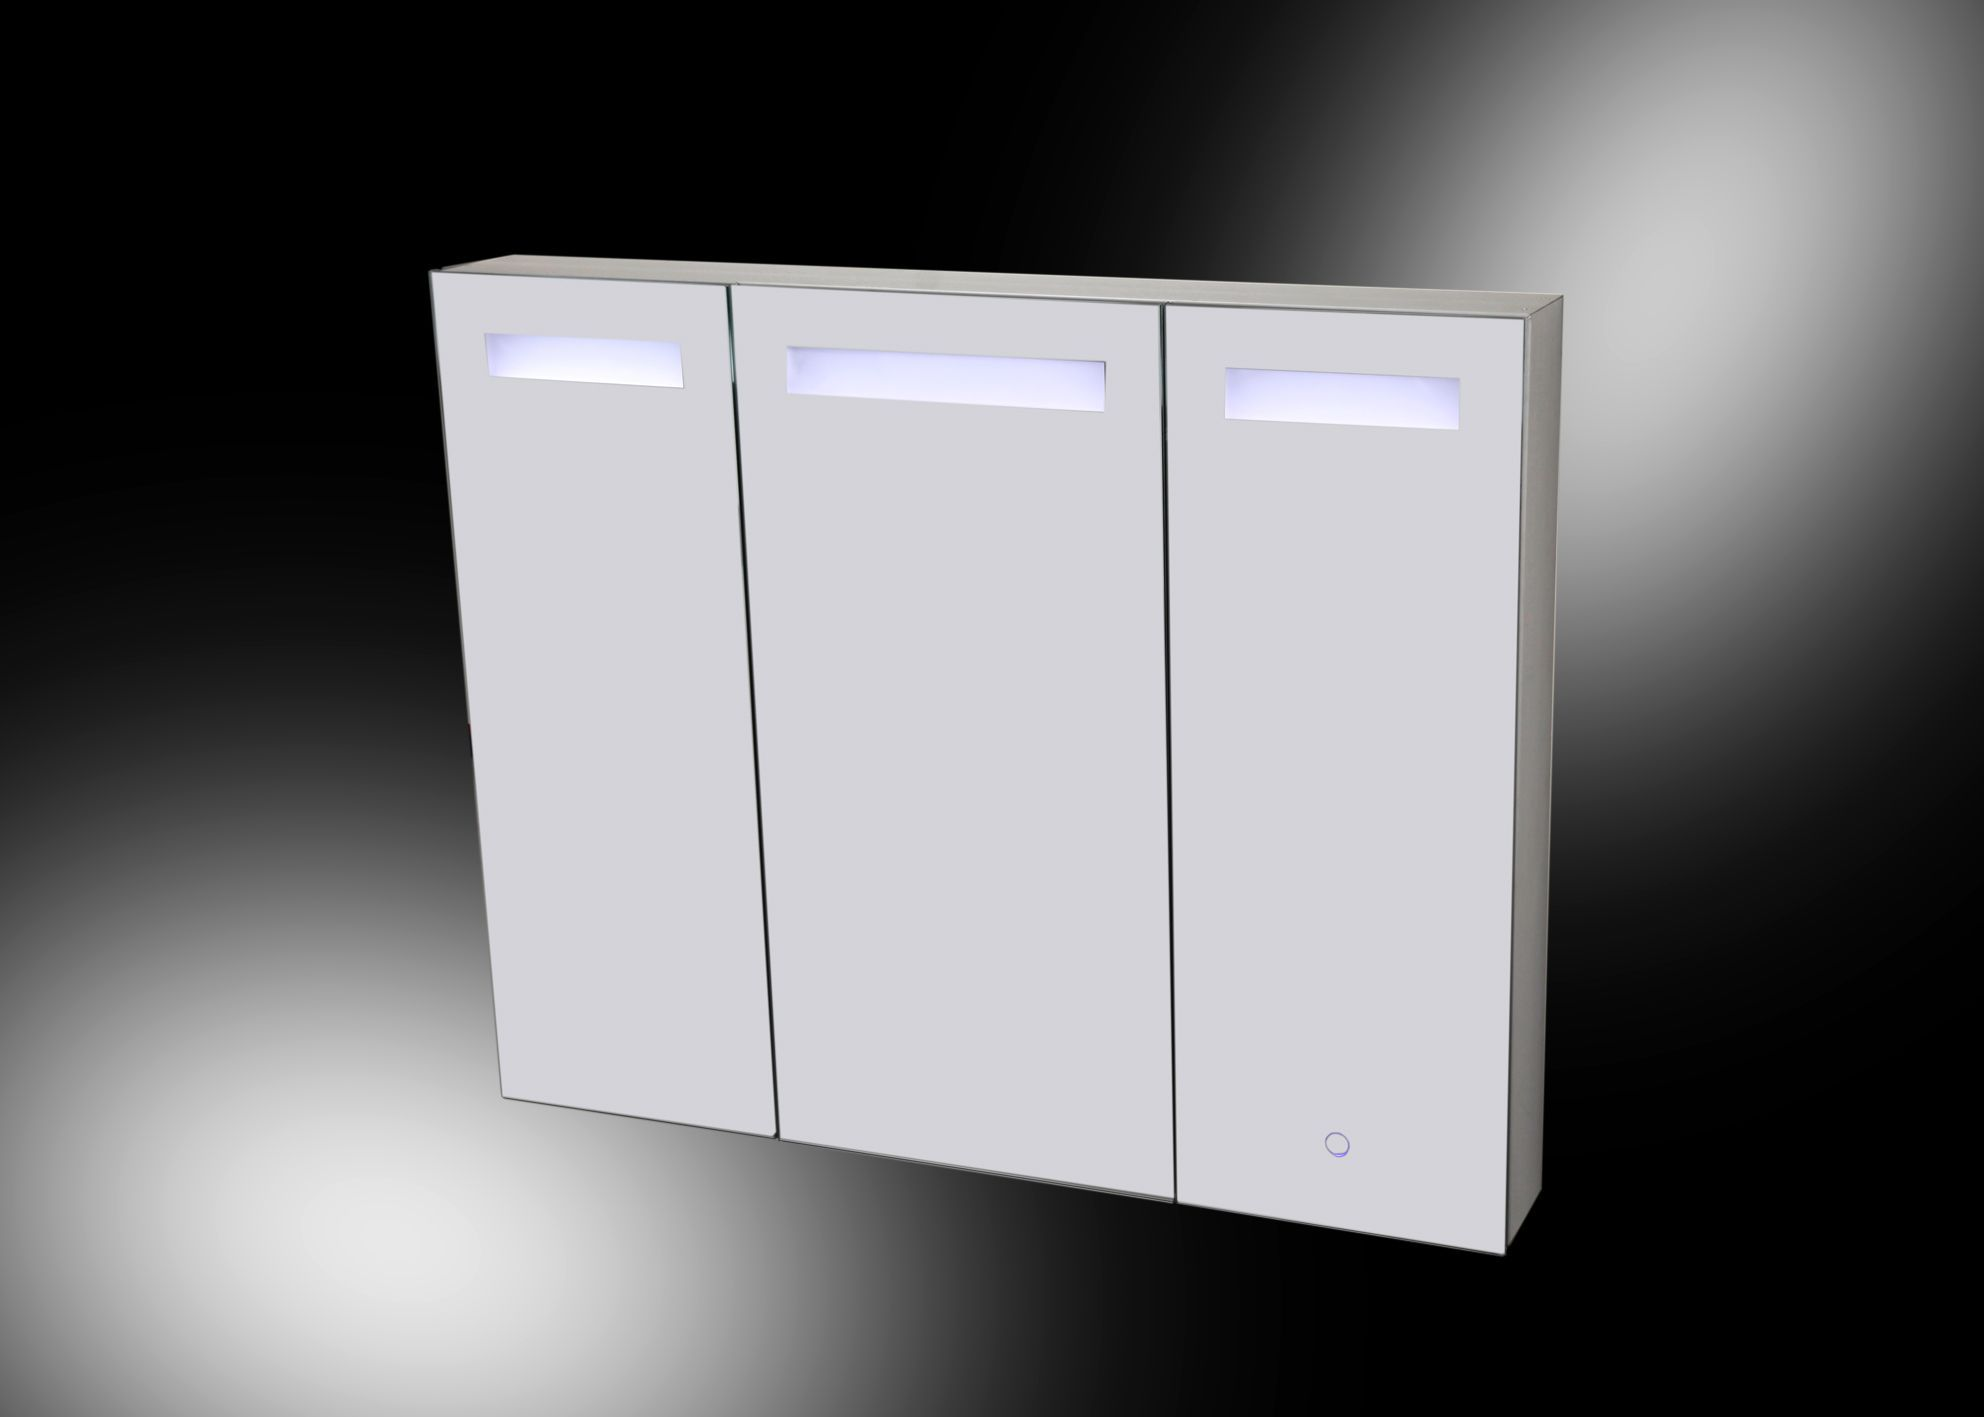 aluma spiegelkast led verlichting 1000x800x135mm aluminium